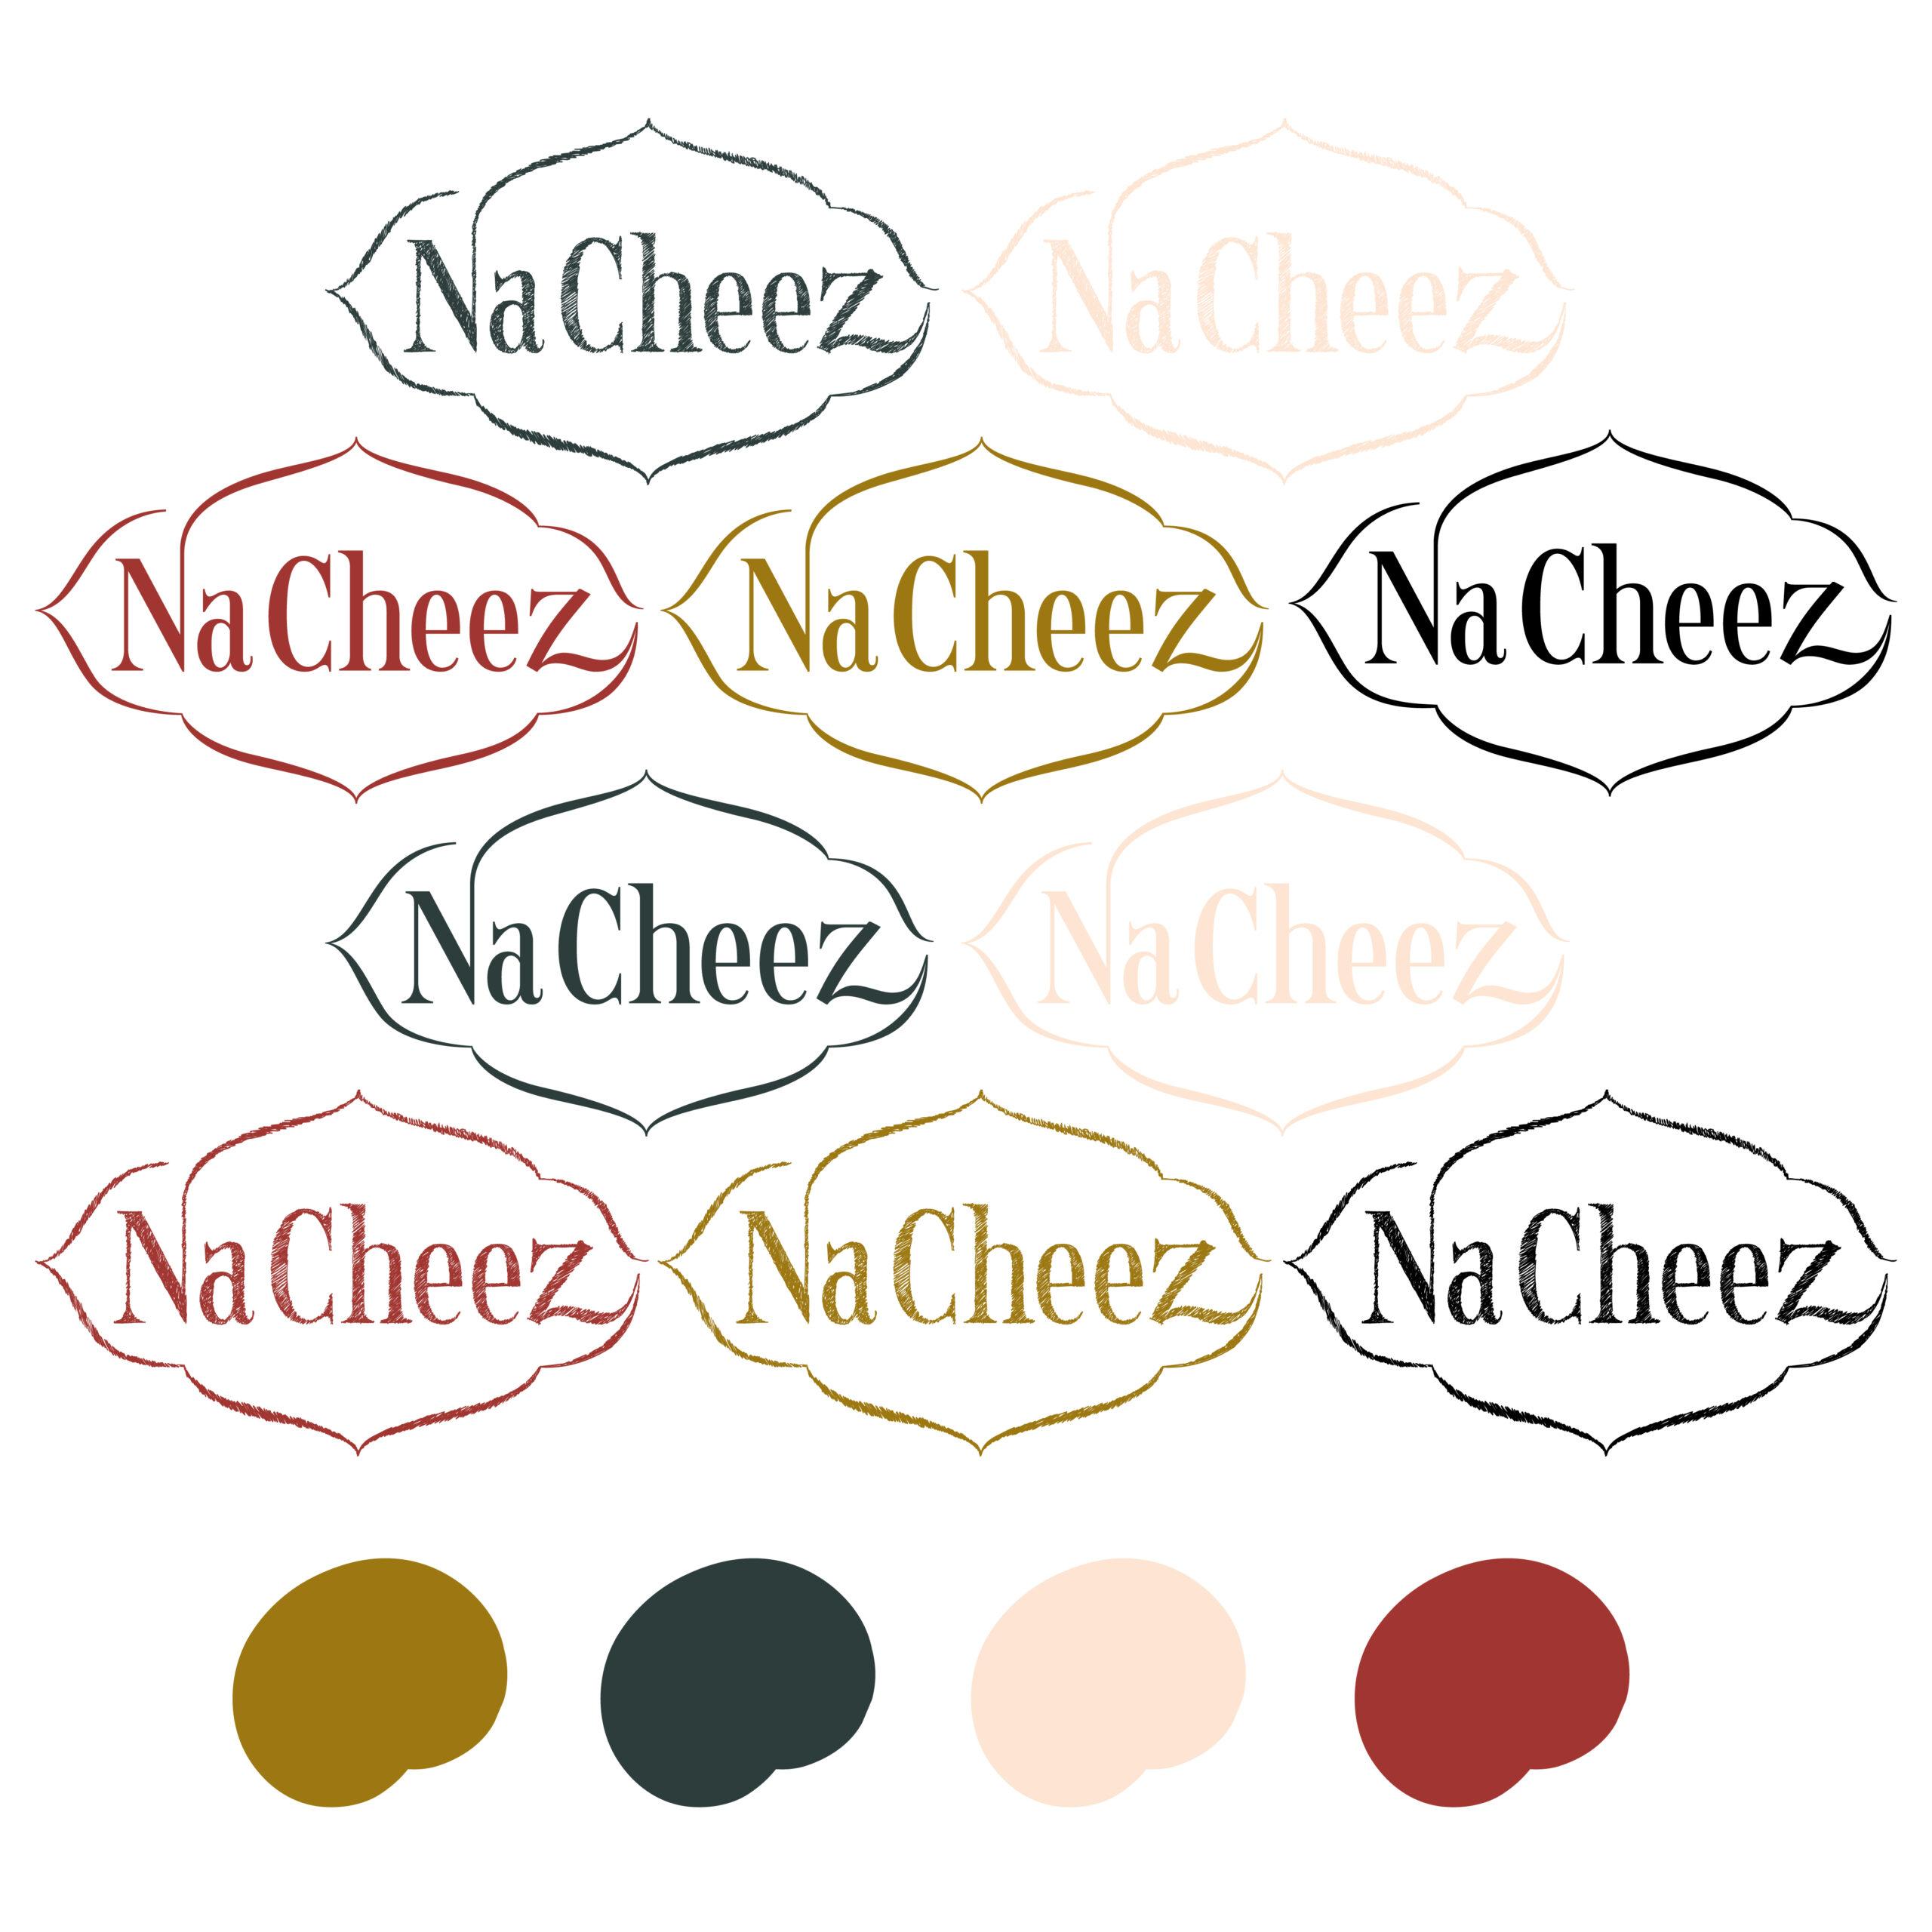 NaCheezLogoFin_F-15